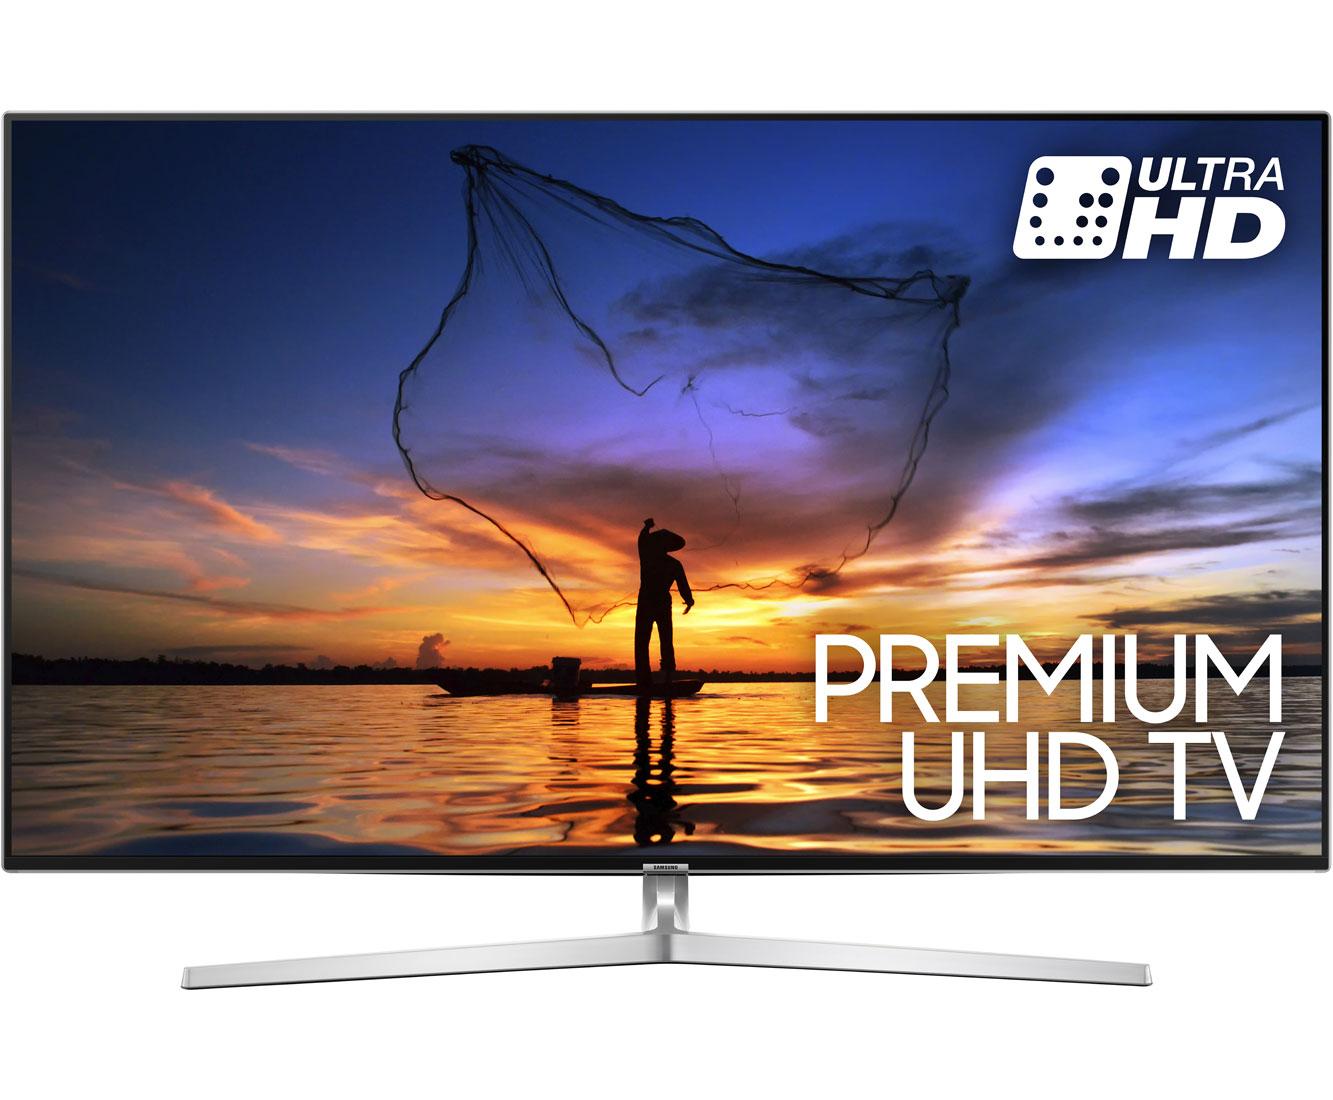 Samsung UE75MU8000 4K Ultra HD TV - 75 inch na cashback voor €2249 @ AO.nl